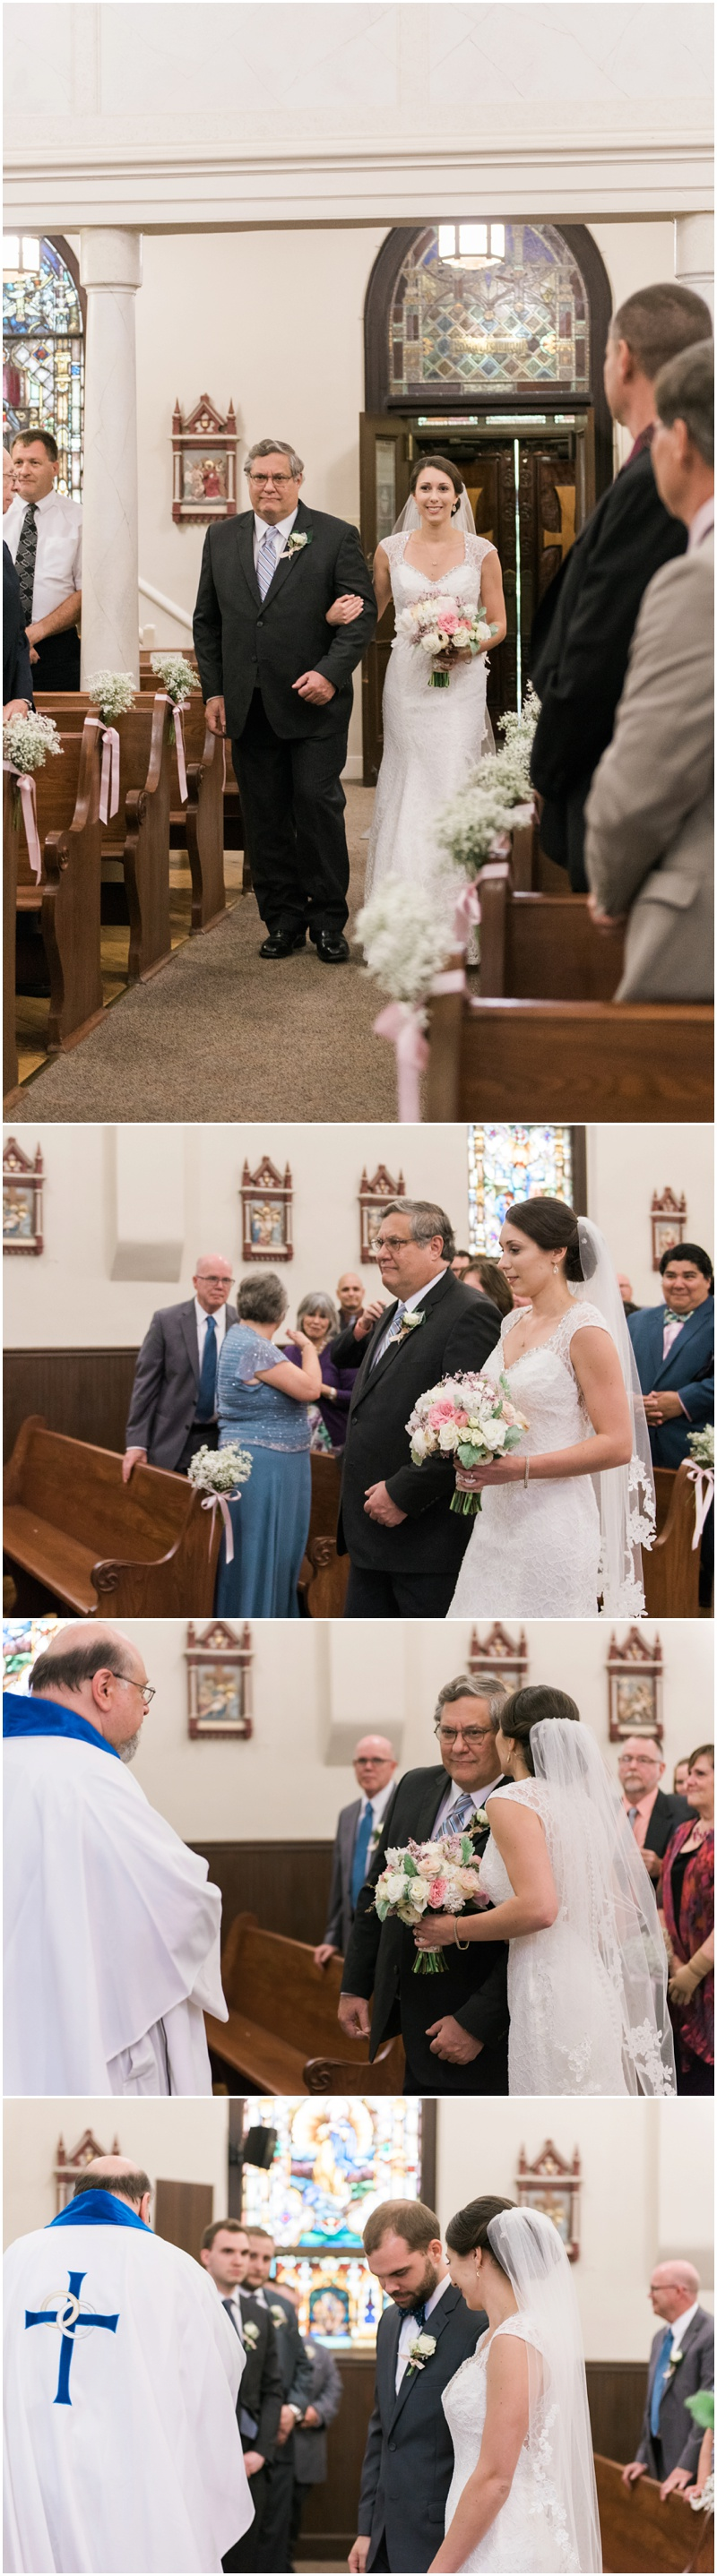 Mccoy-Emmett Wedding-14.JPG